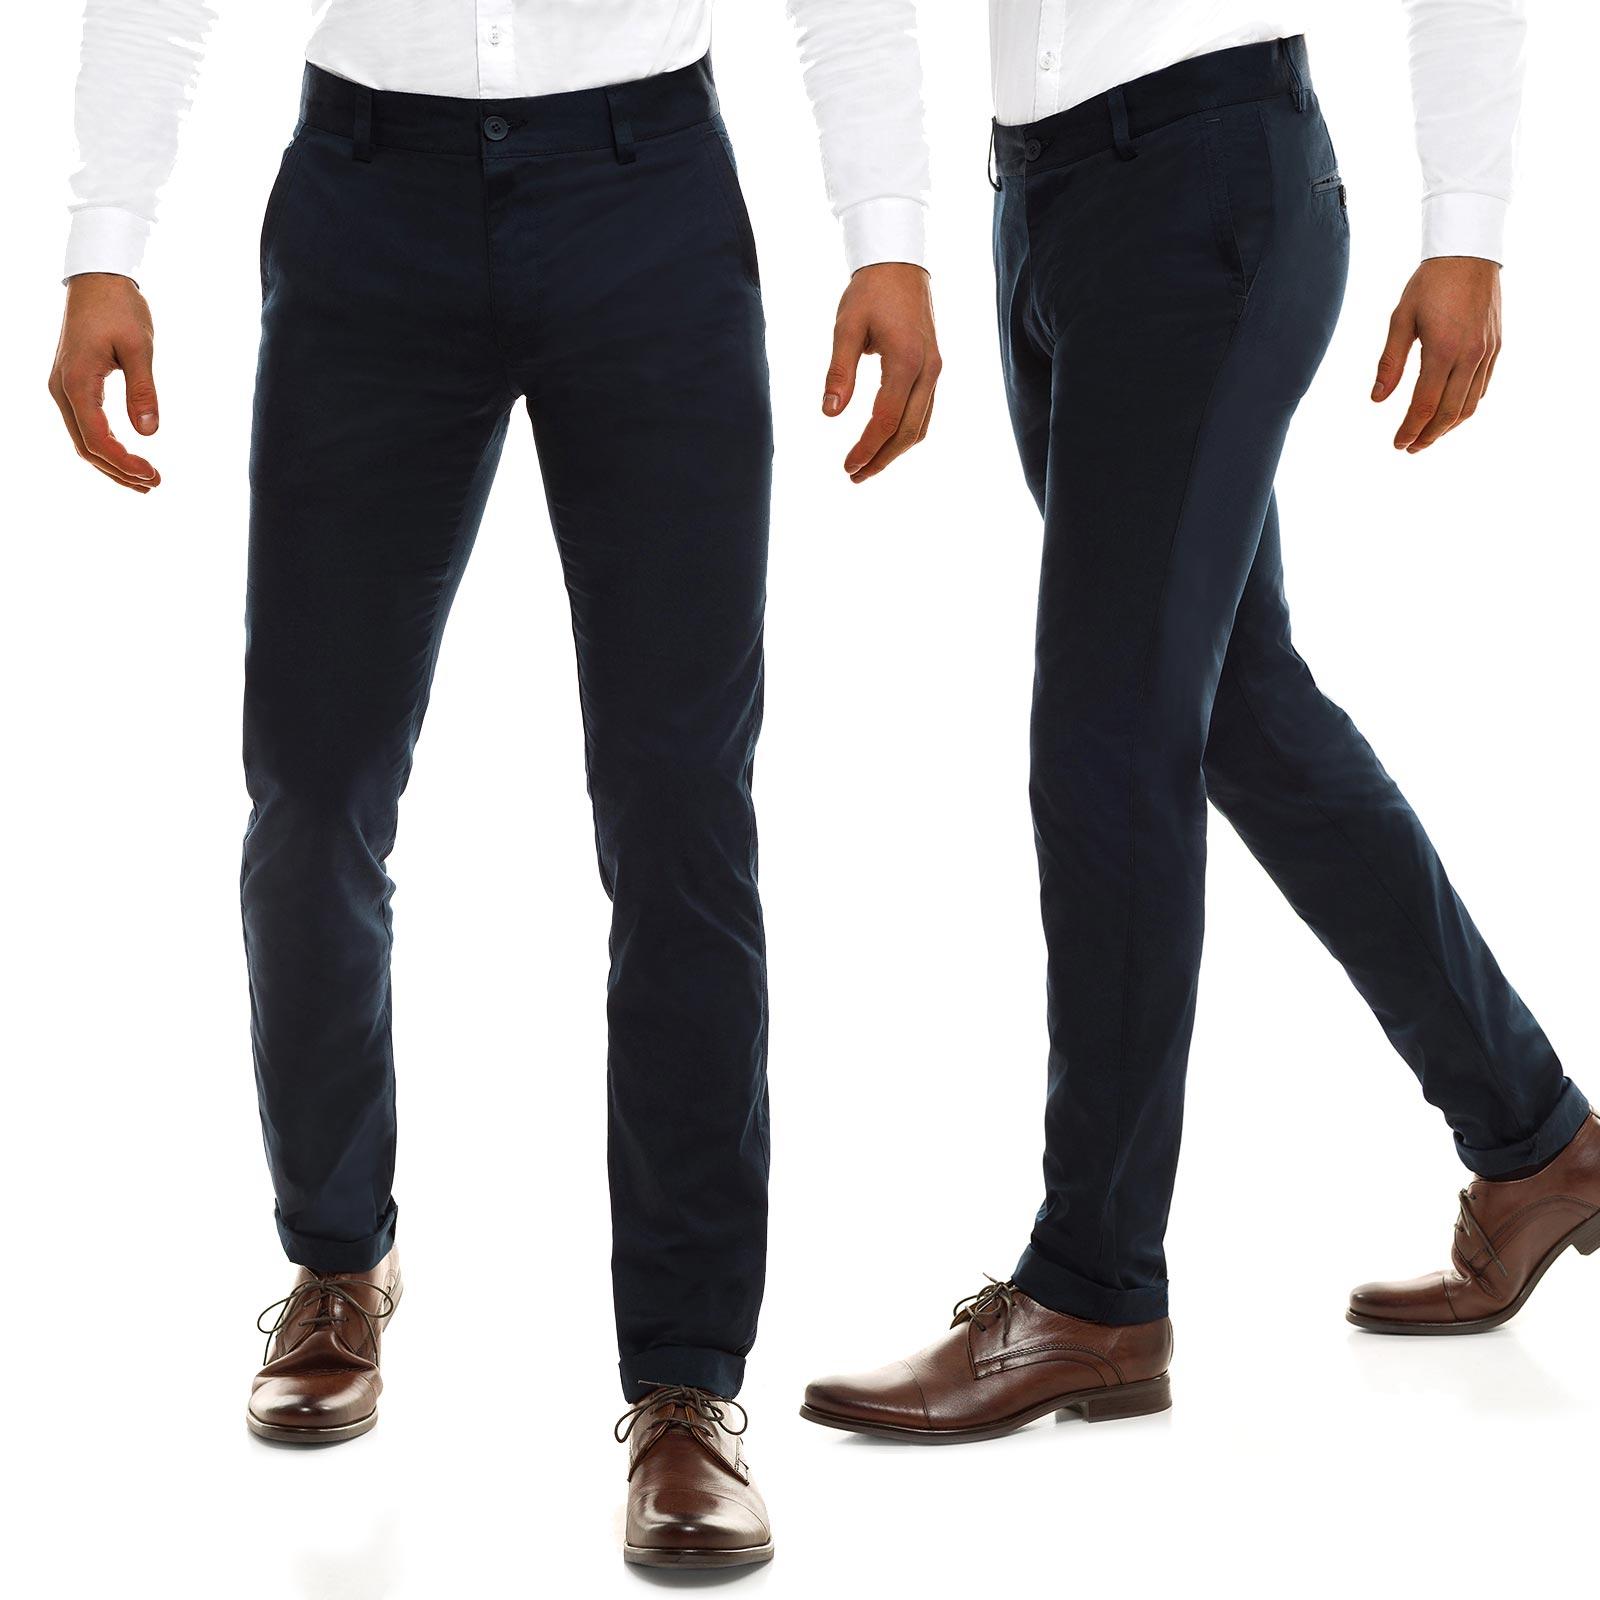 Business Uomo Black 206 Tailleur Pantaloni Ozonee Rock con Chino qZA8g